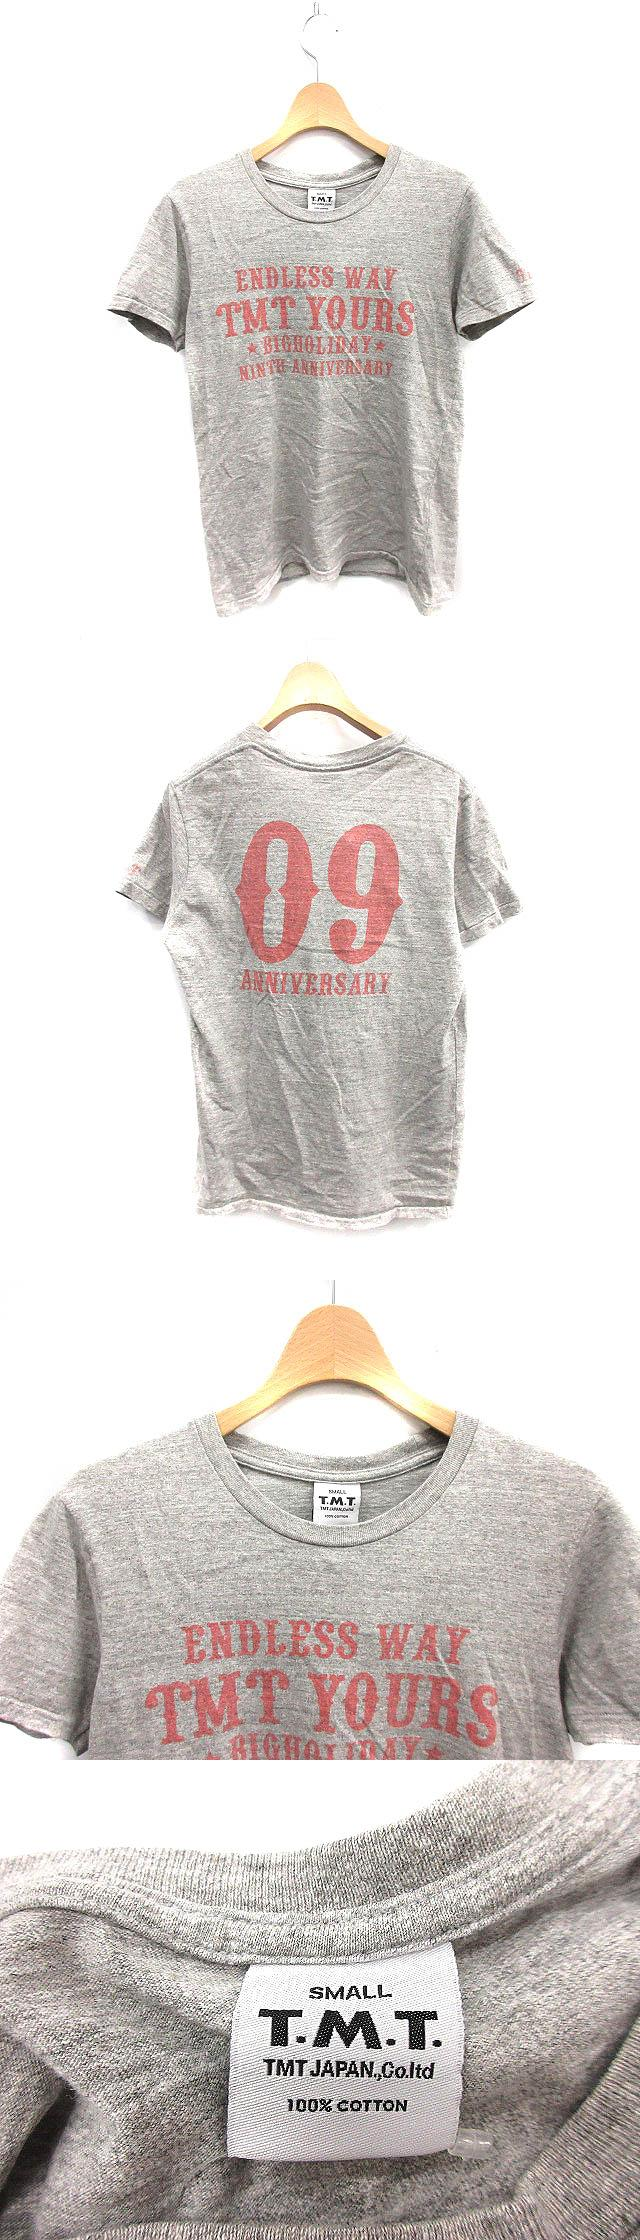 Tシャツ カットソー 半袖 ロゴ S グレー /CY26